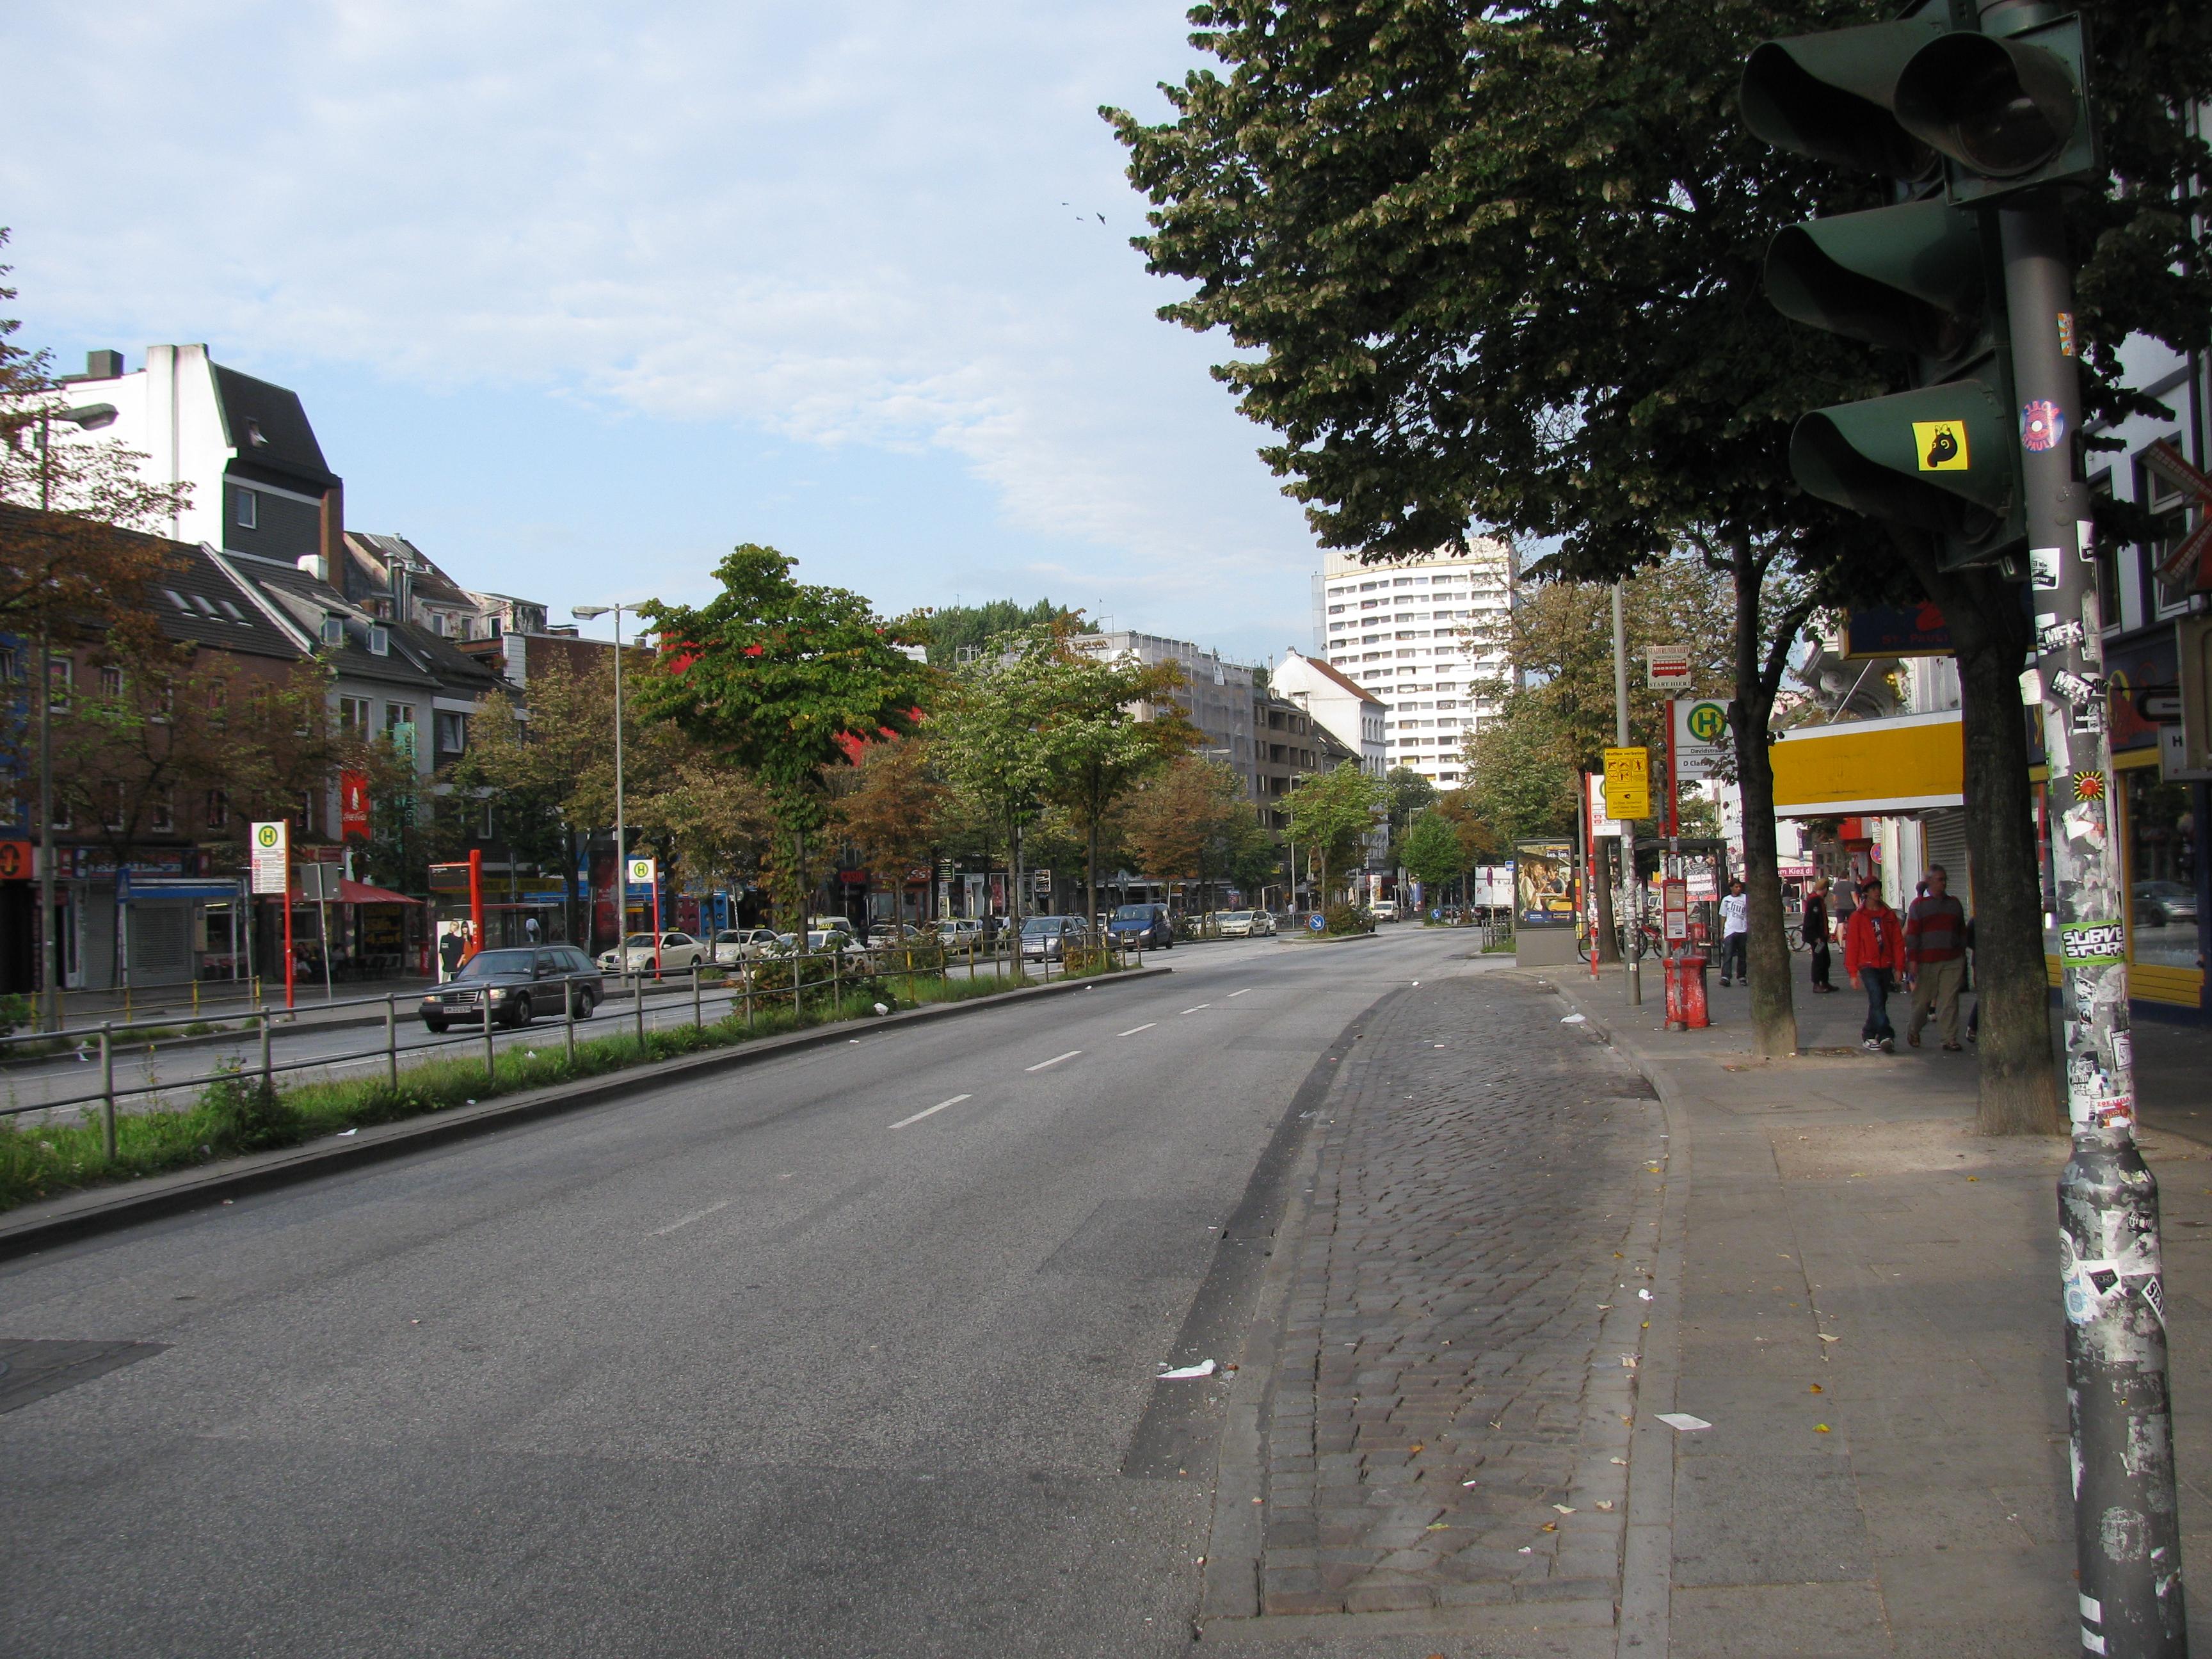 File:Bushaltestelle Davidstraße, 1, St. Pauli, Hamburg.jpg